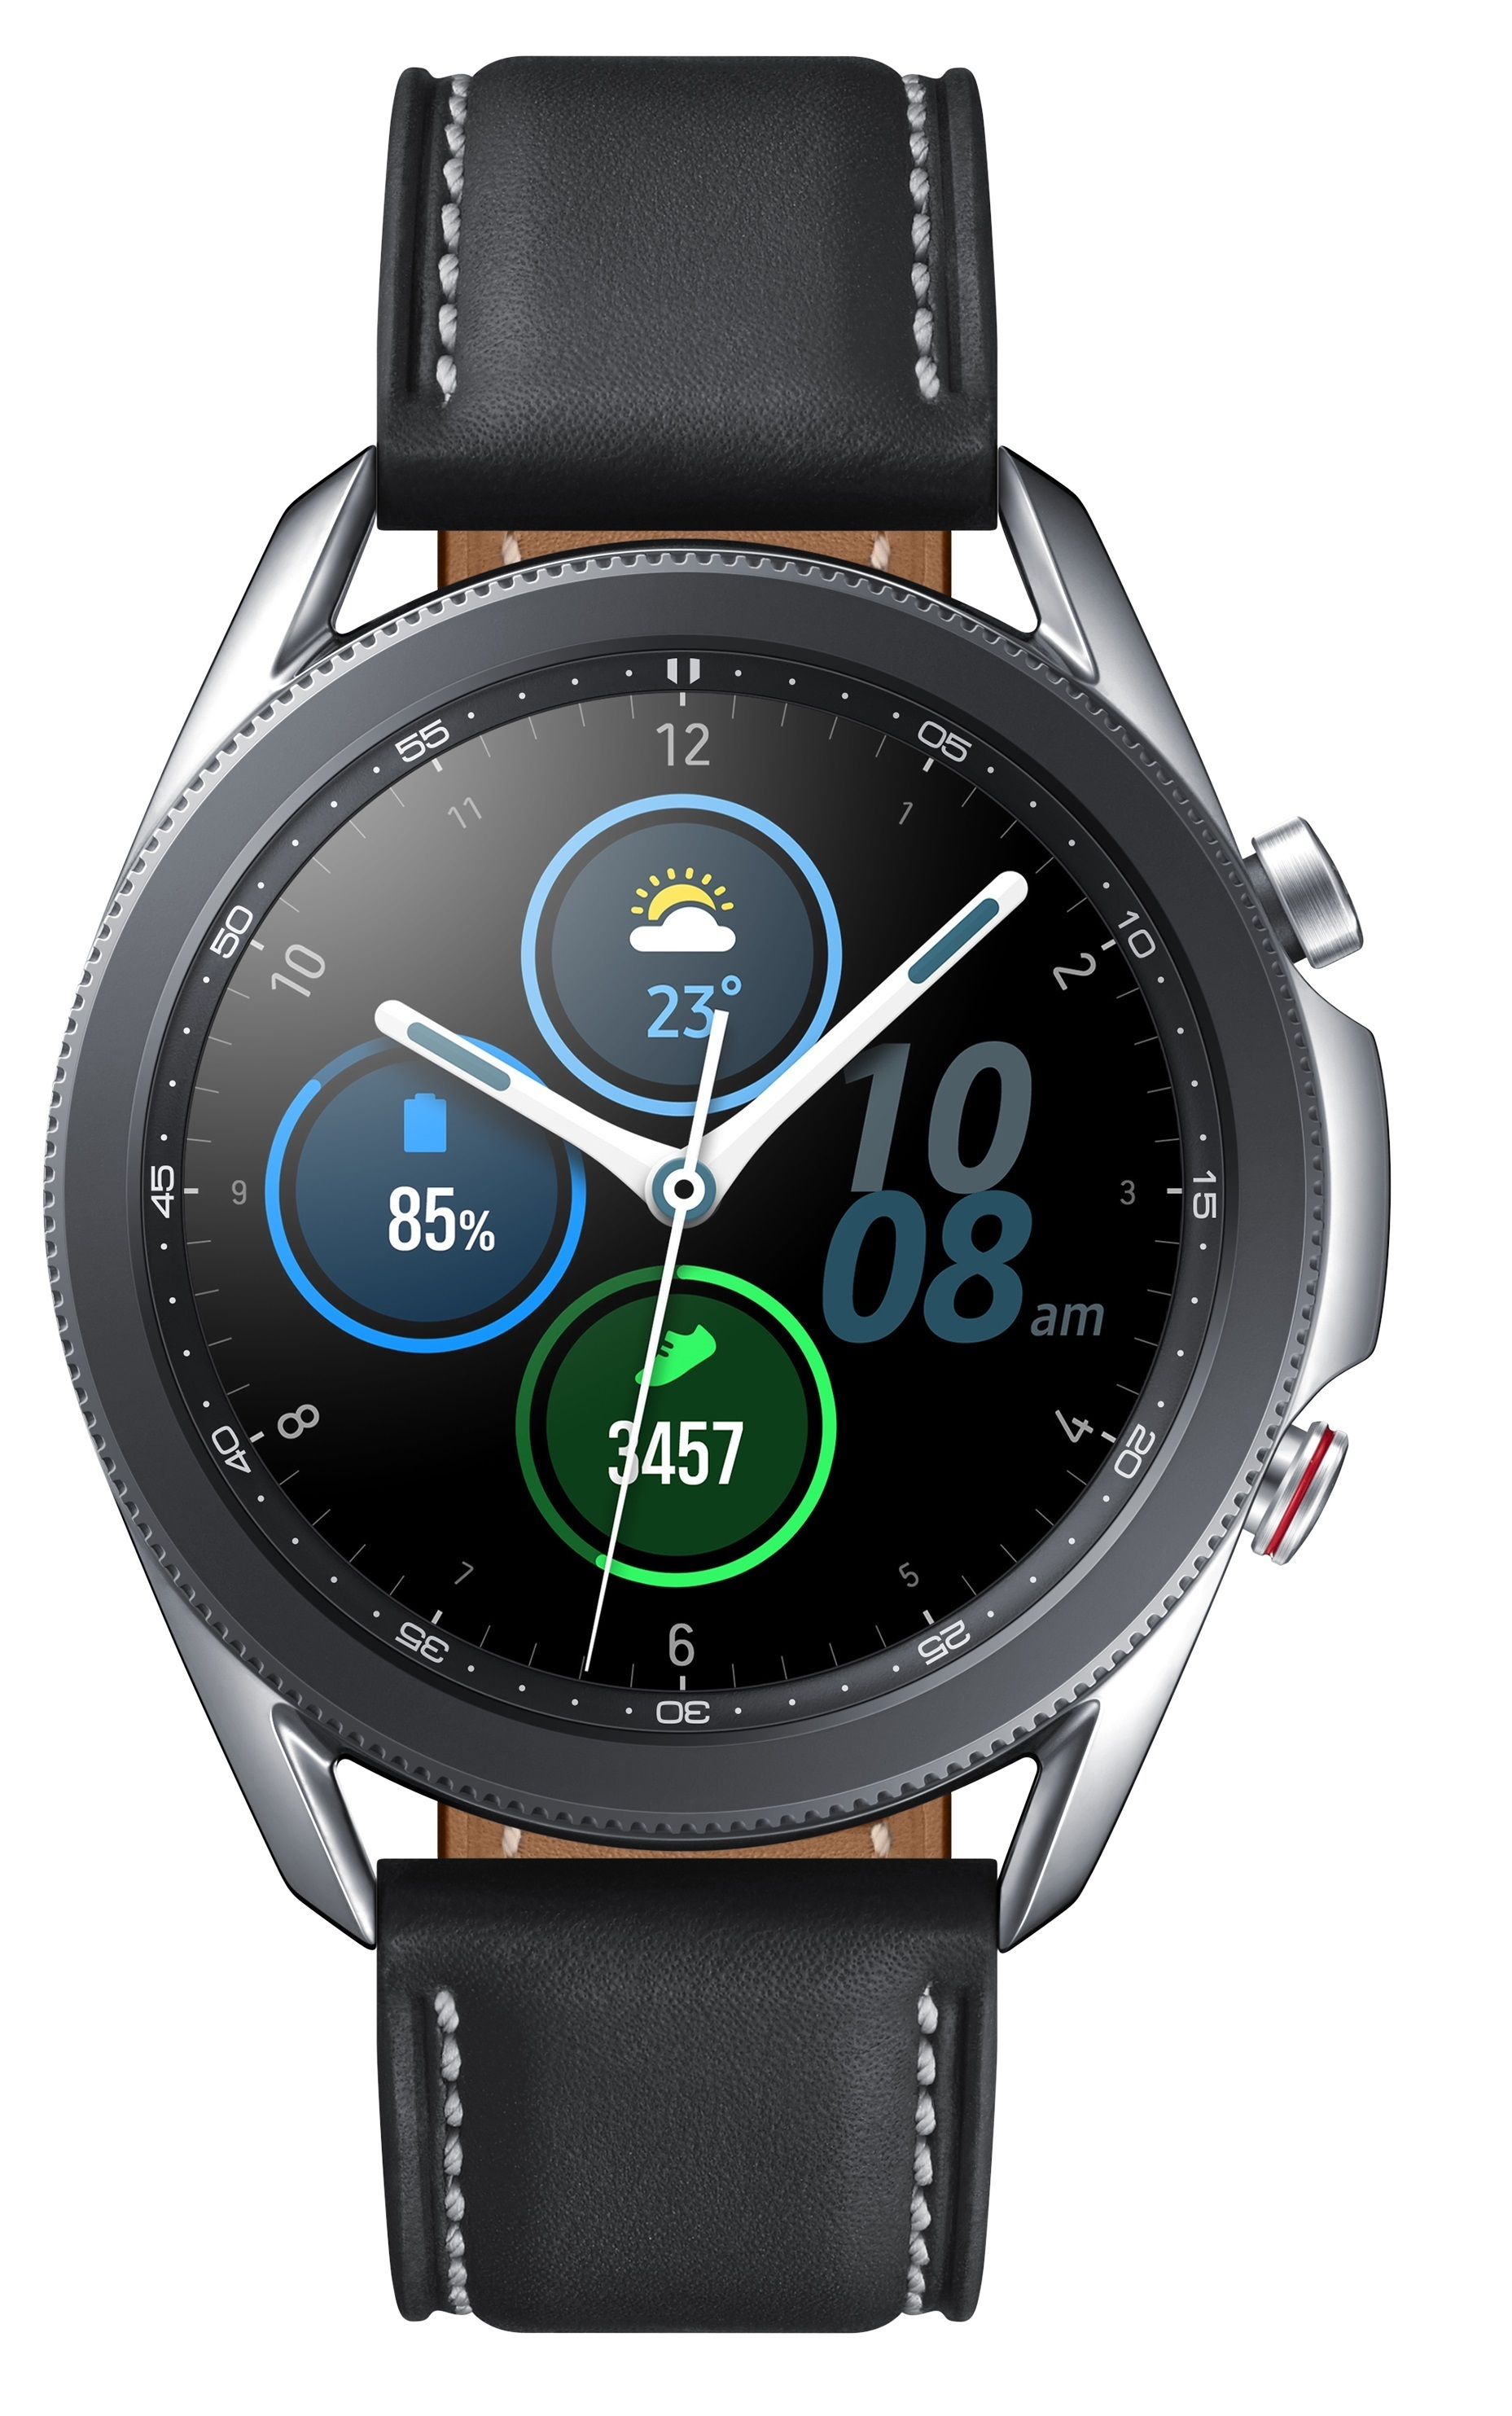 Montre connectée Galaxy Watch 3 SM-R840 4G 45 mm Samsung Argent